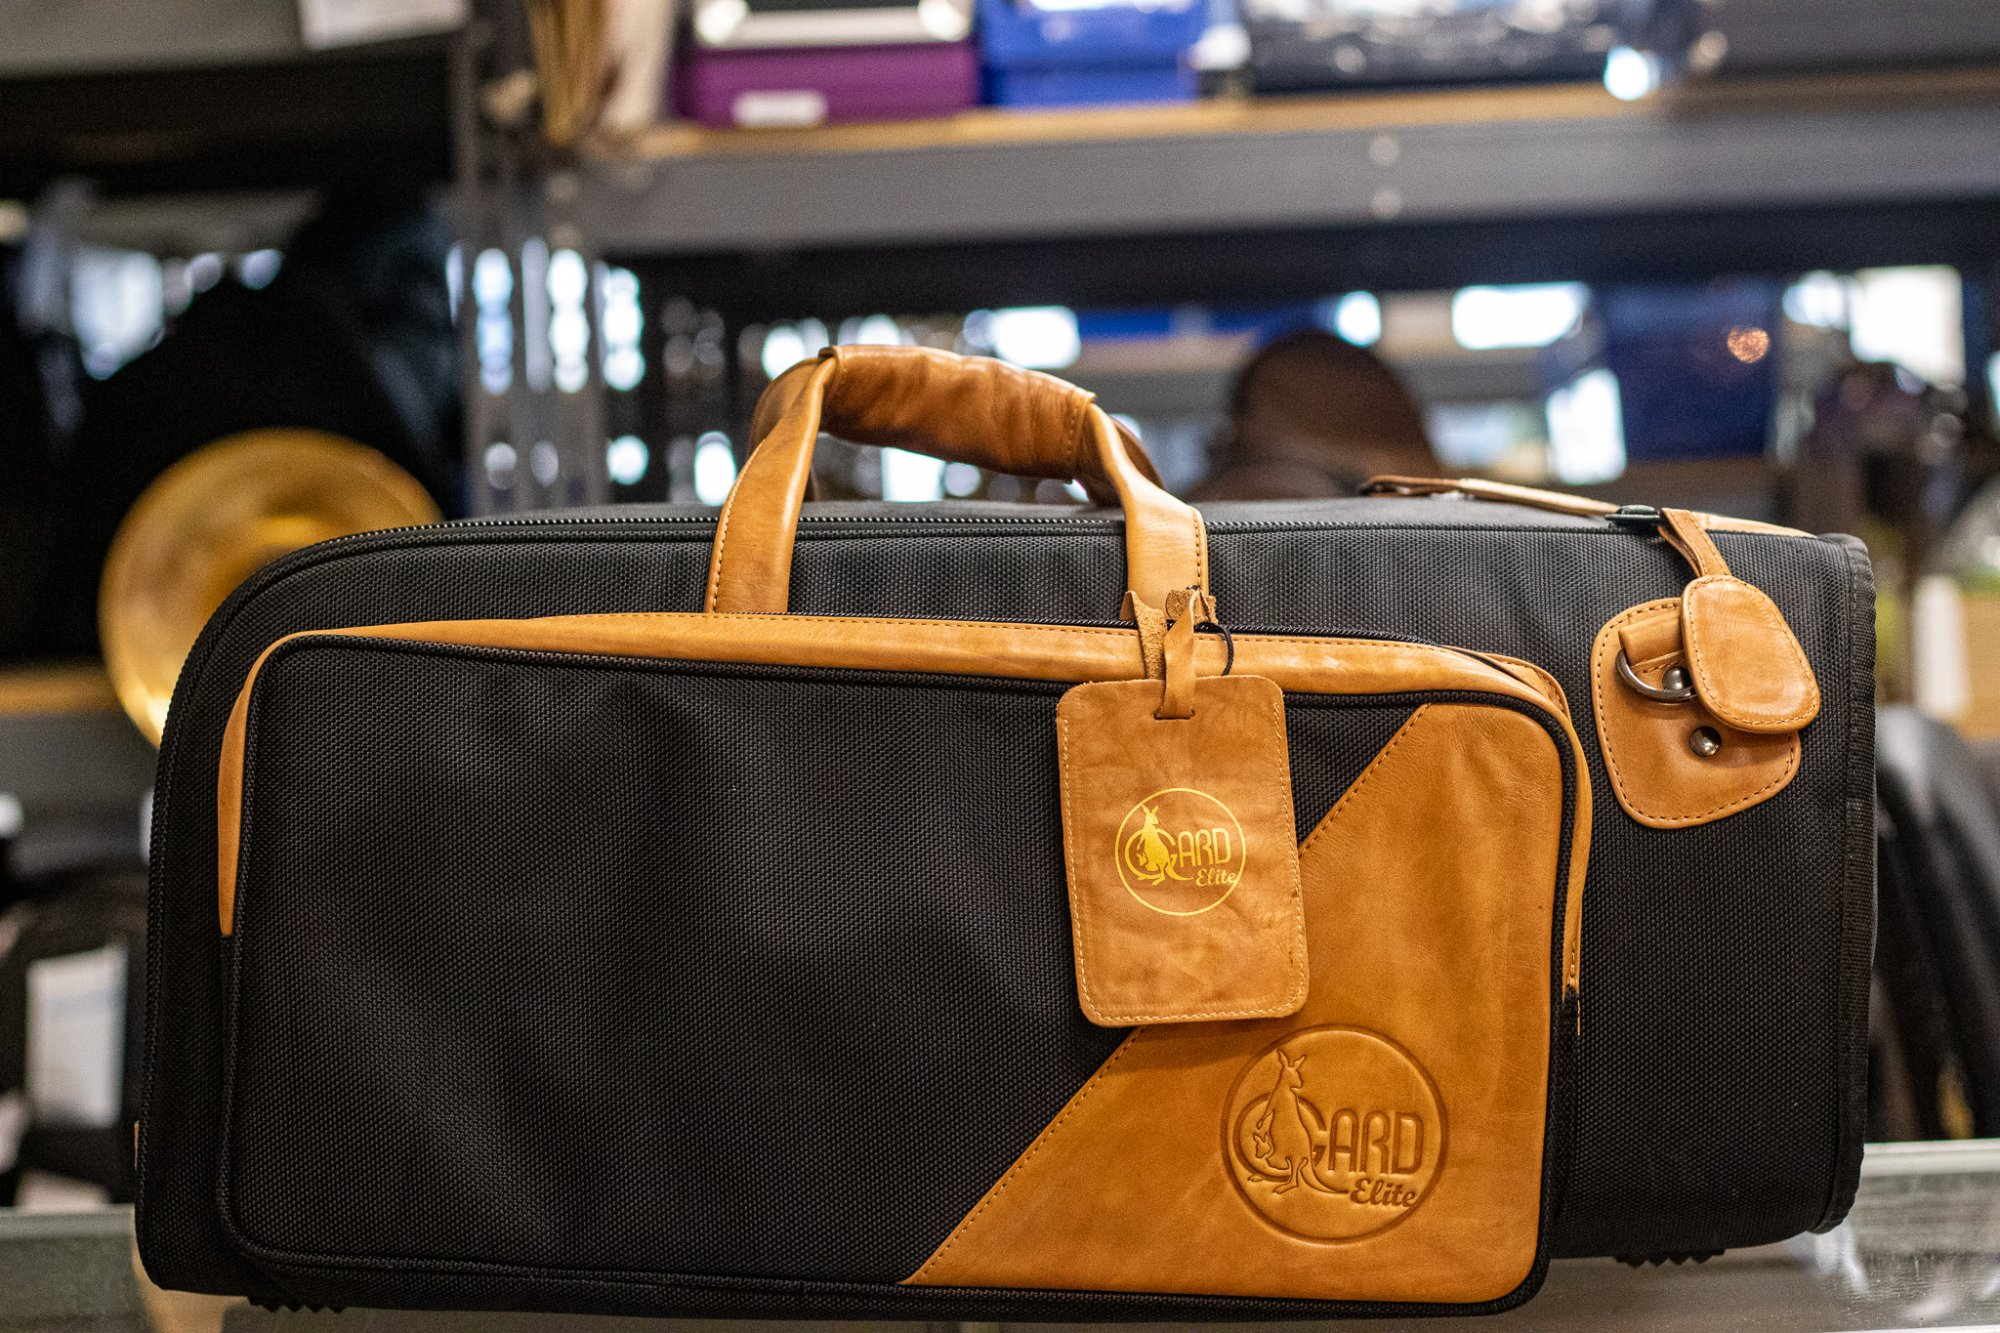 17-ESK GARD Elite - Trumpet + Flugelhorn Gig Bag Synthetic with Leather Trim